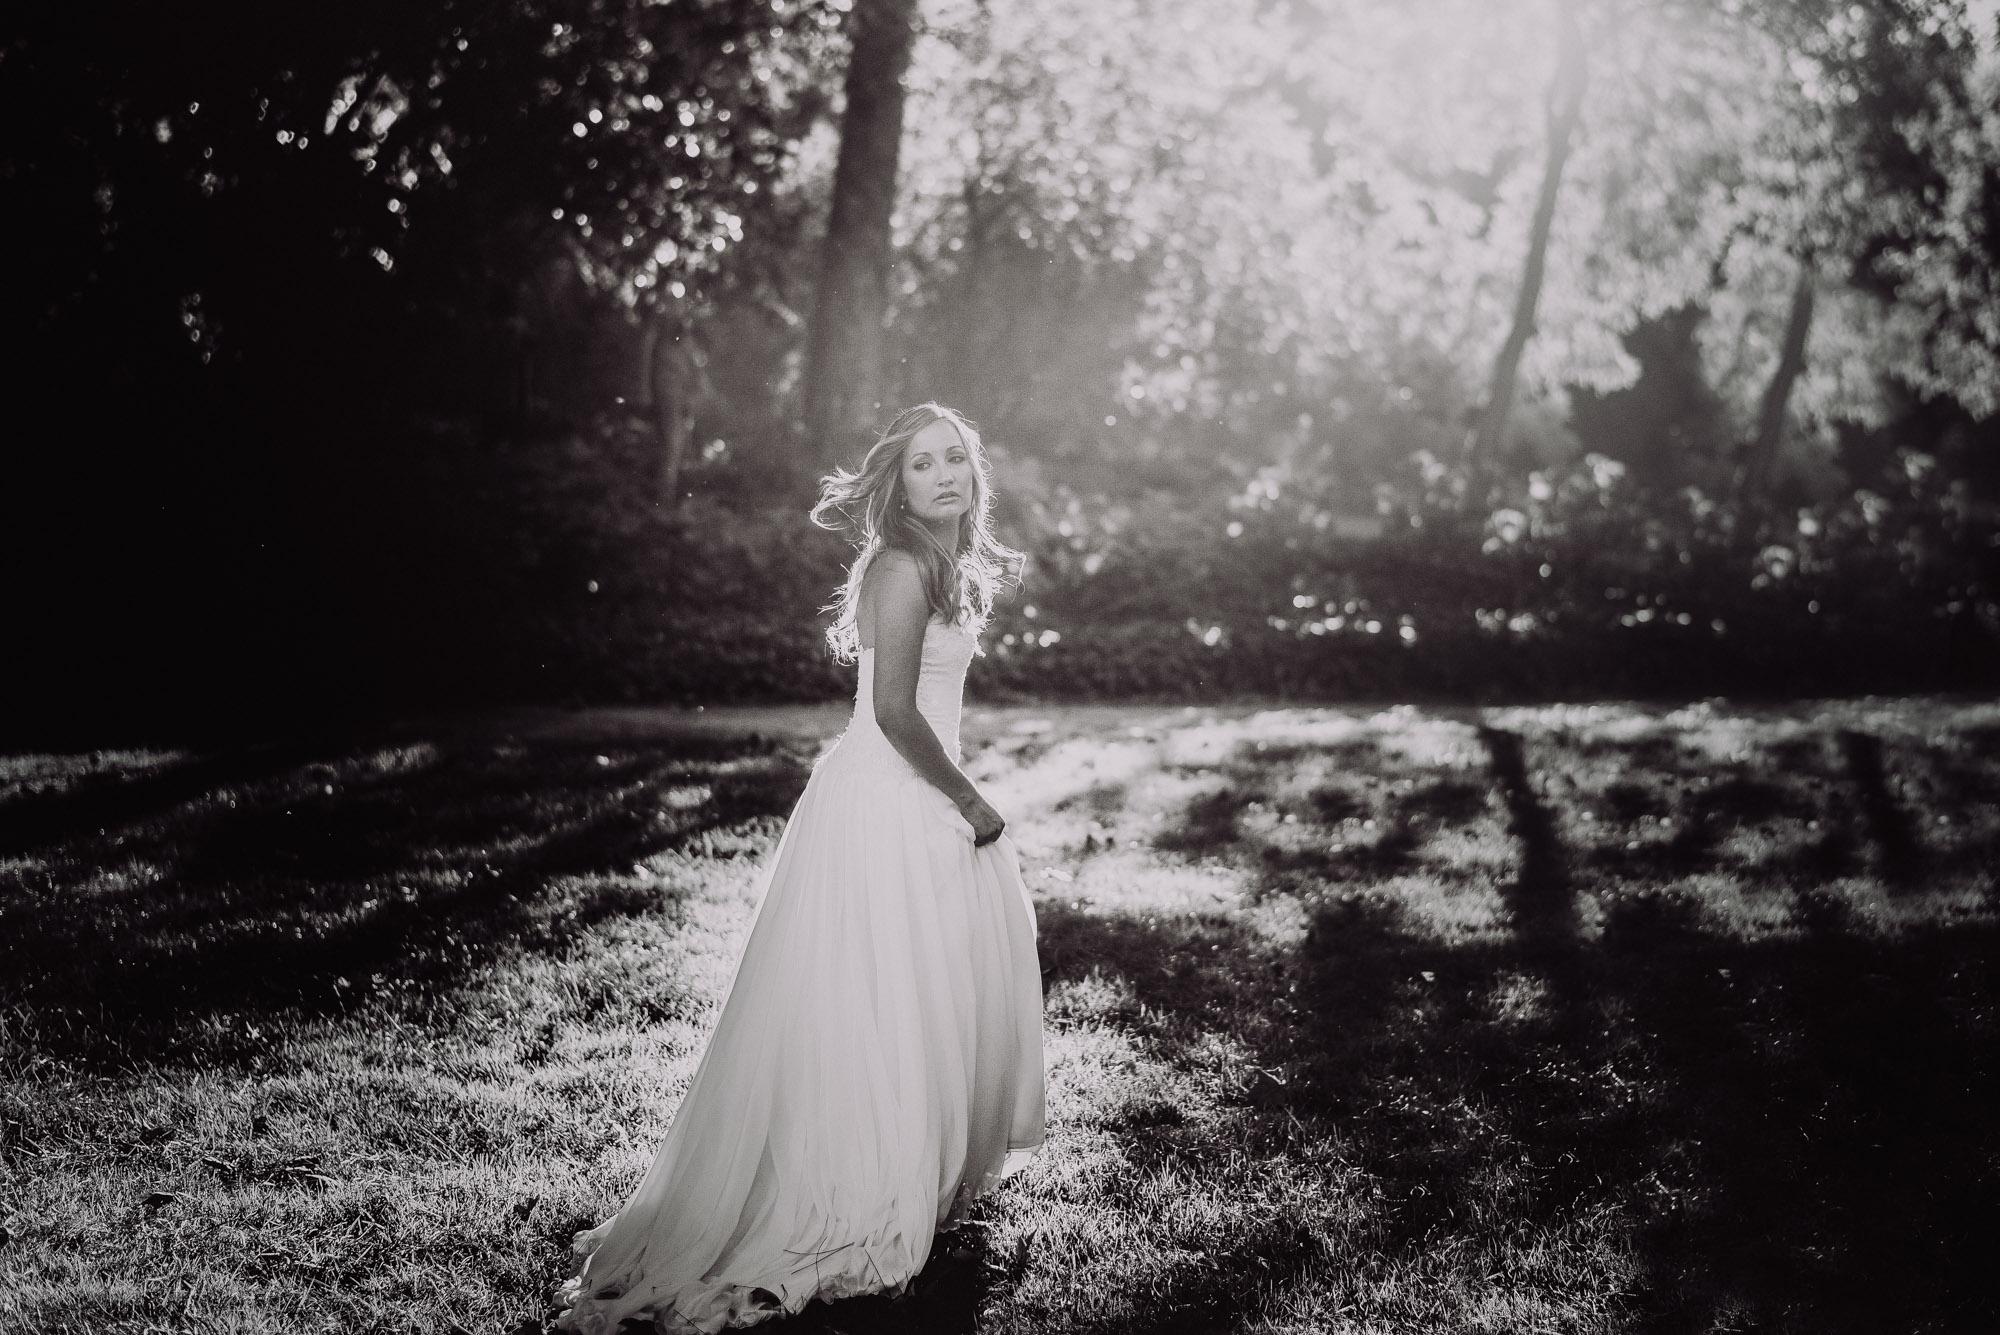 fotografos de boda diferentes, fotografía de boda documental, postboda el capricho